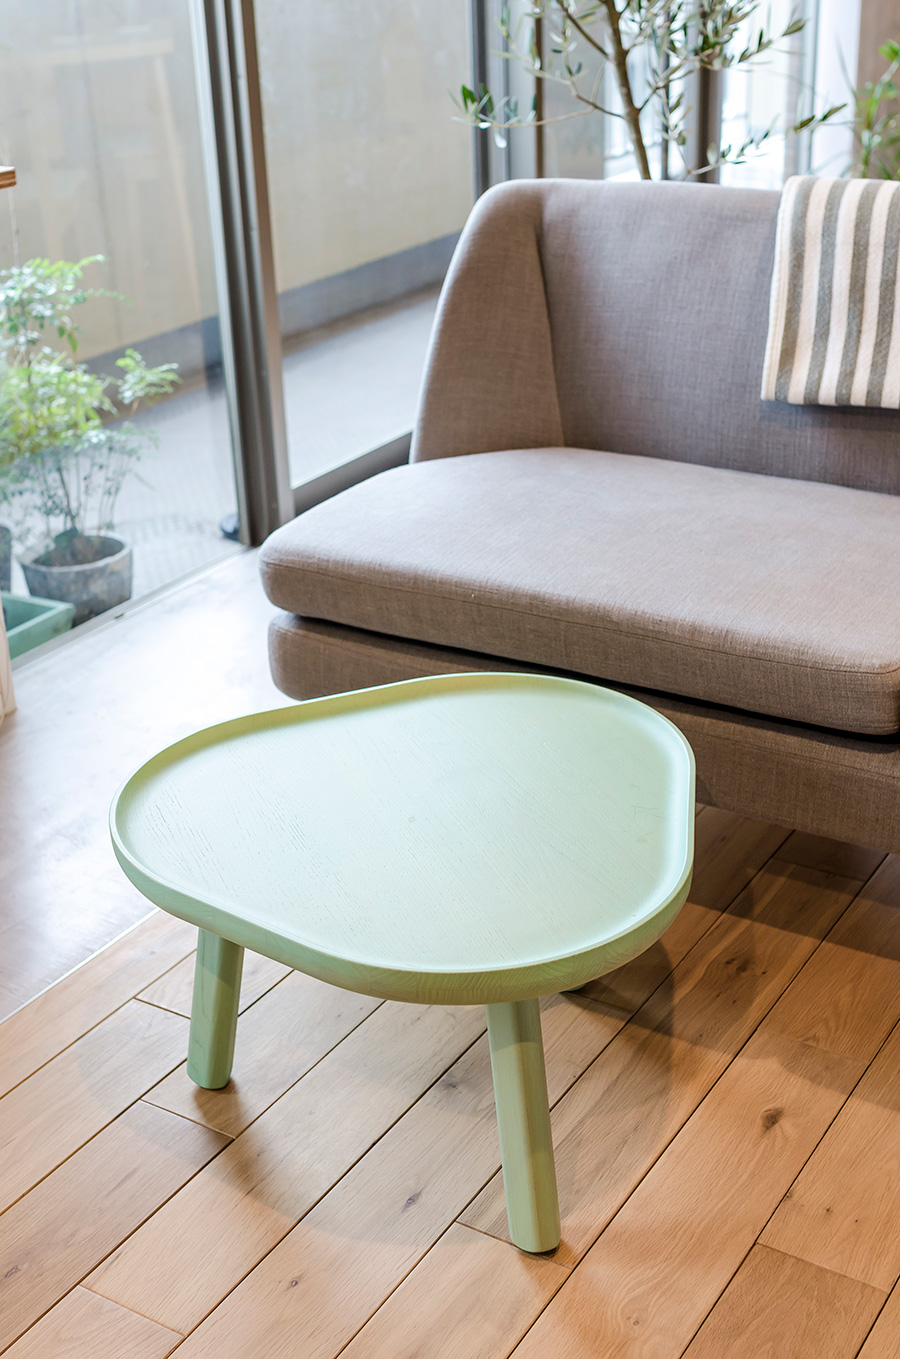 「KARIMOKU NEW STANDARD」の三角ローテーブル。